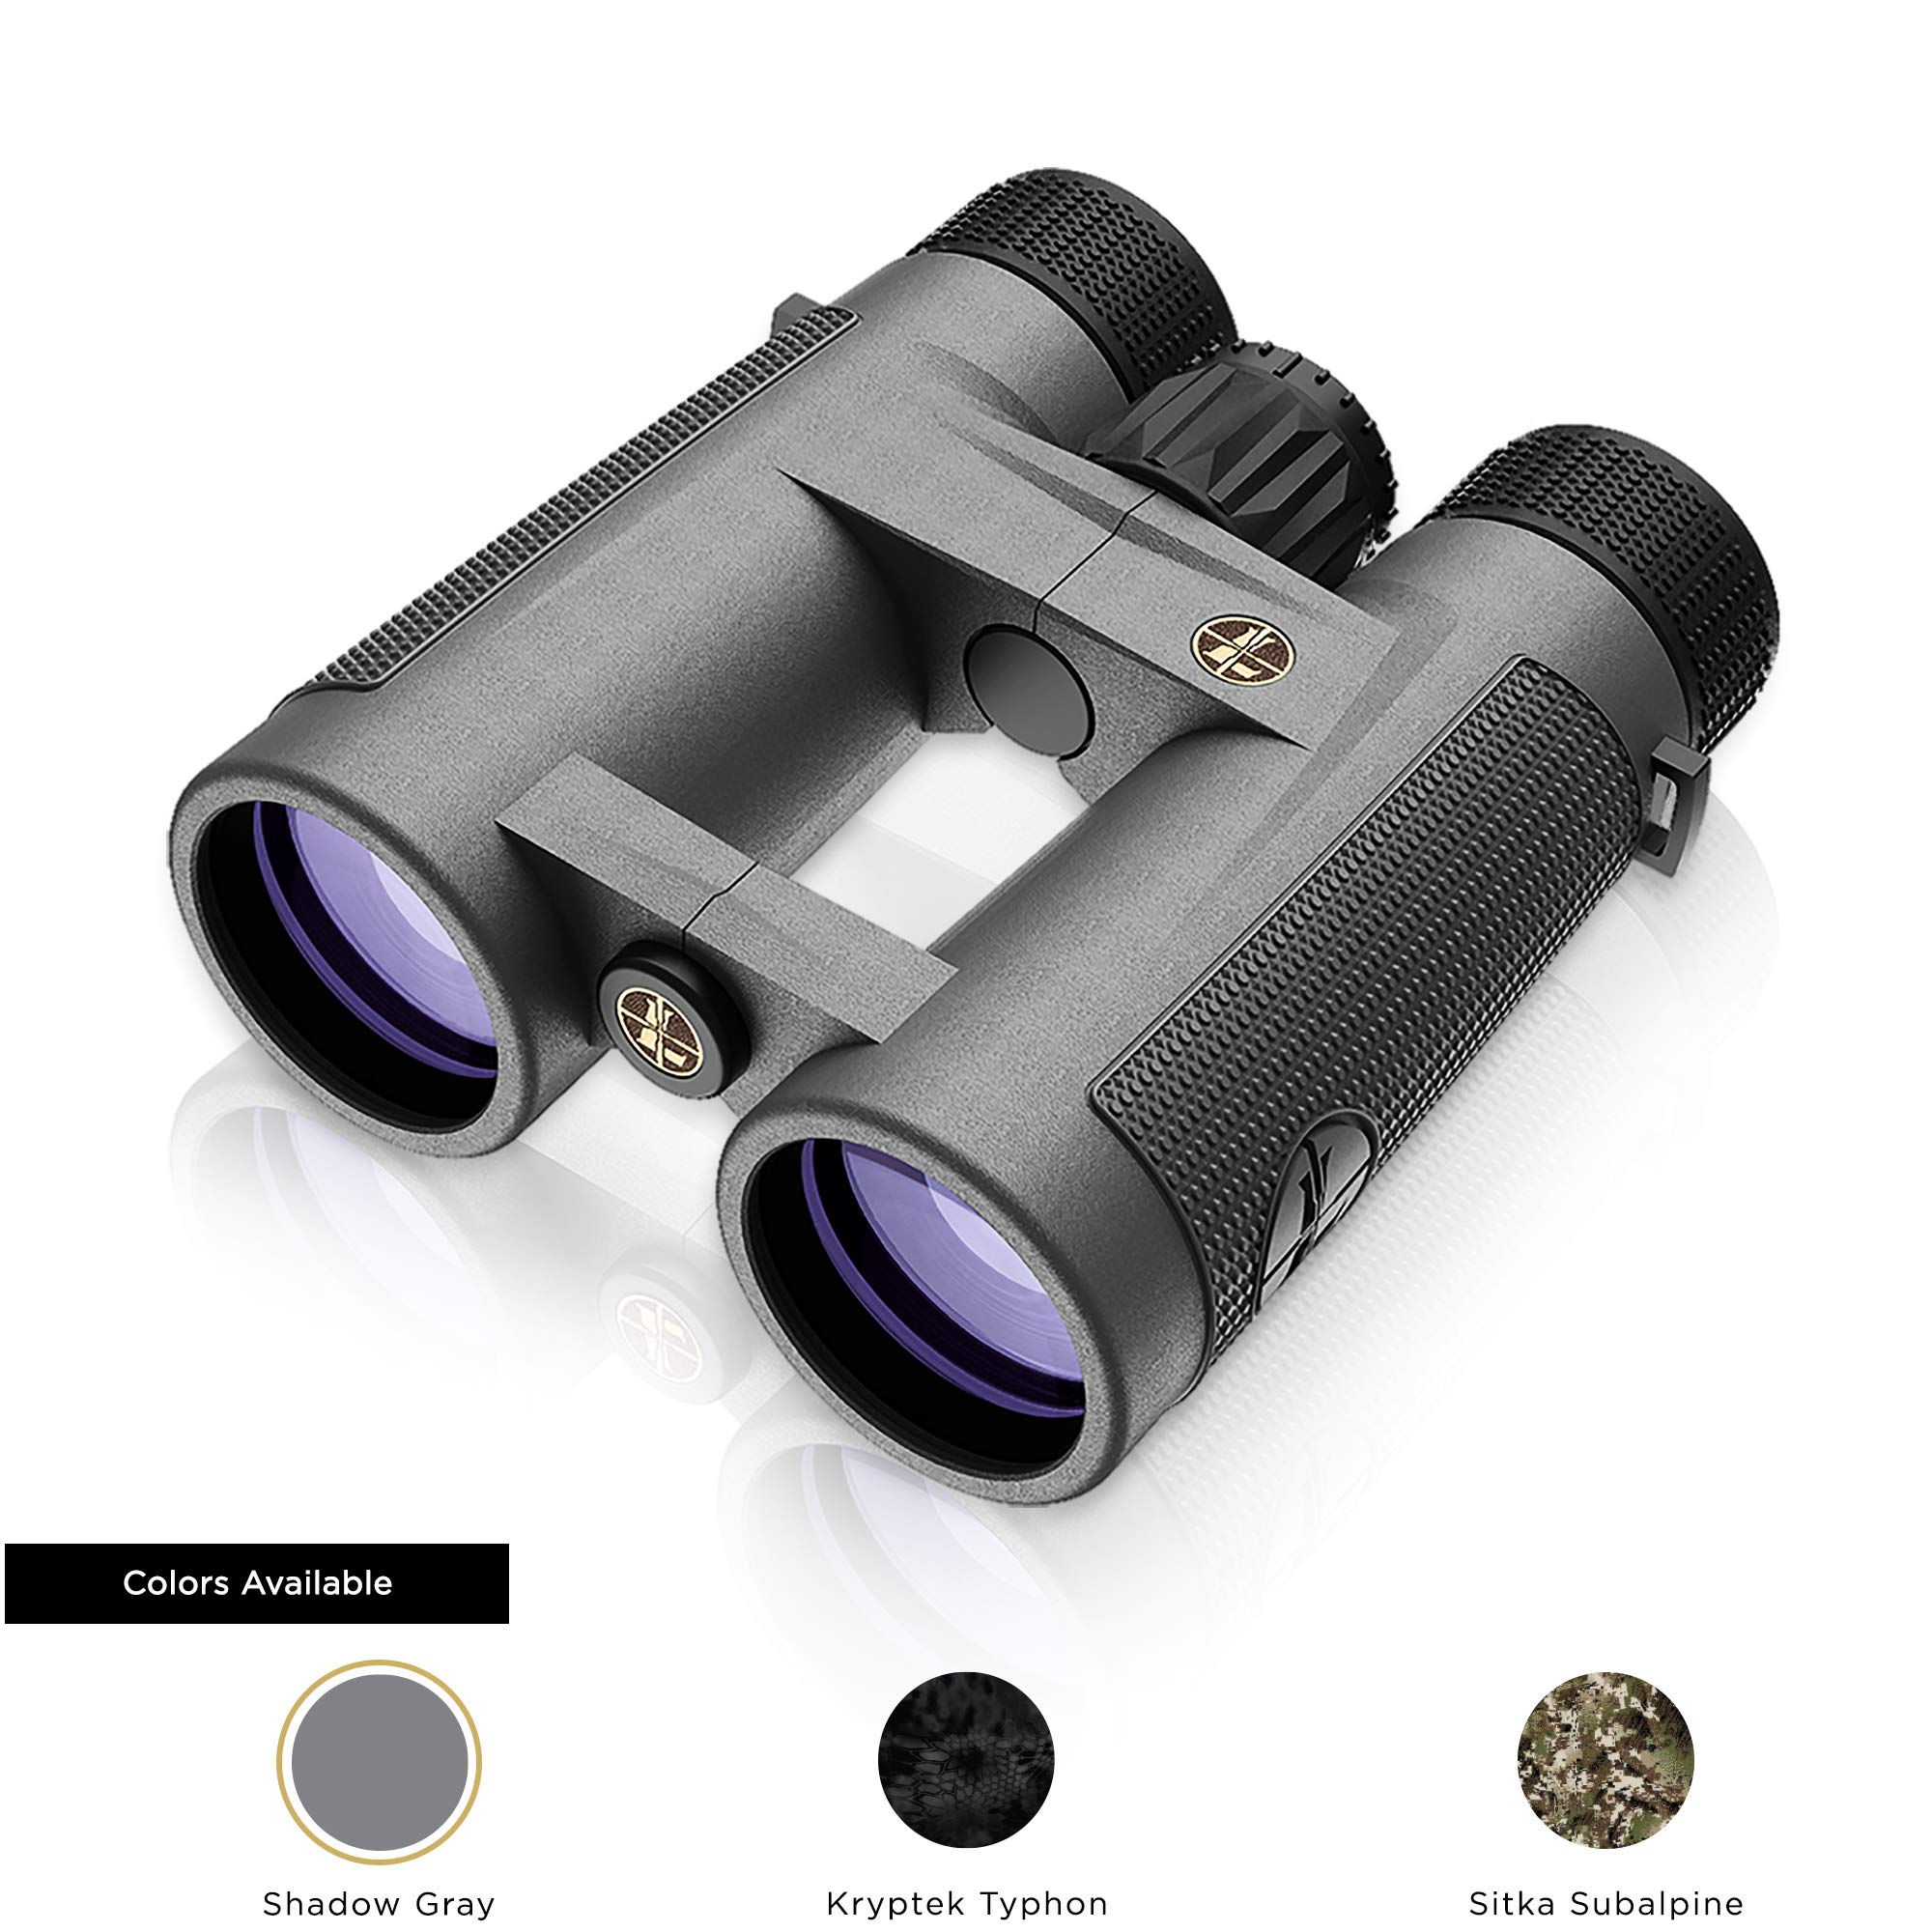 Leupold BX-4 Pro Guide HD 10x42mm Binocular by Leupold